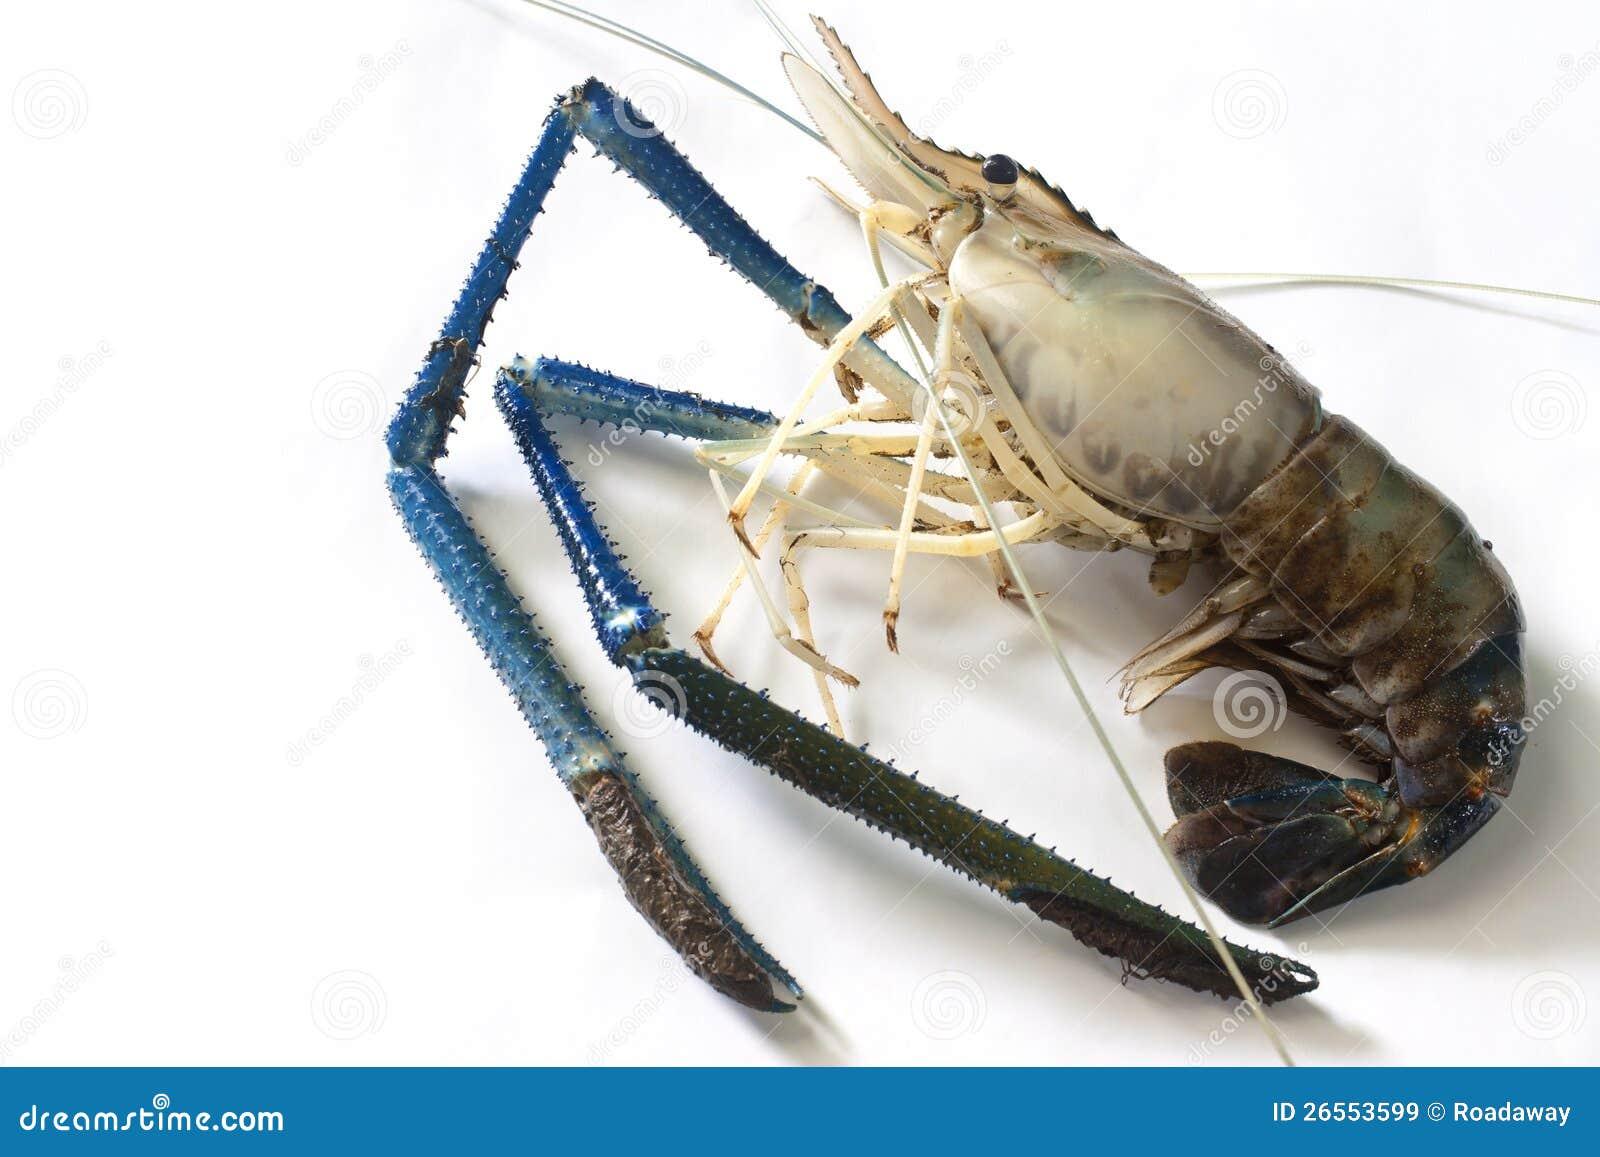 Giant freshwater prawn stock image  Image of life, cook